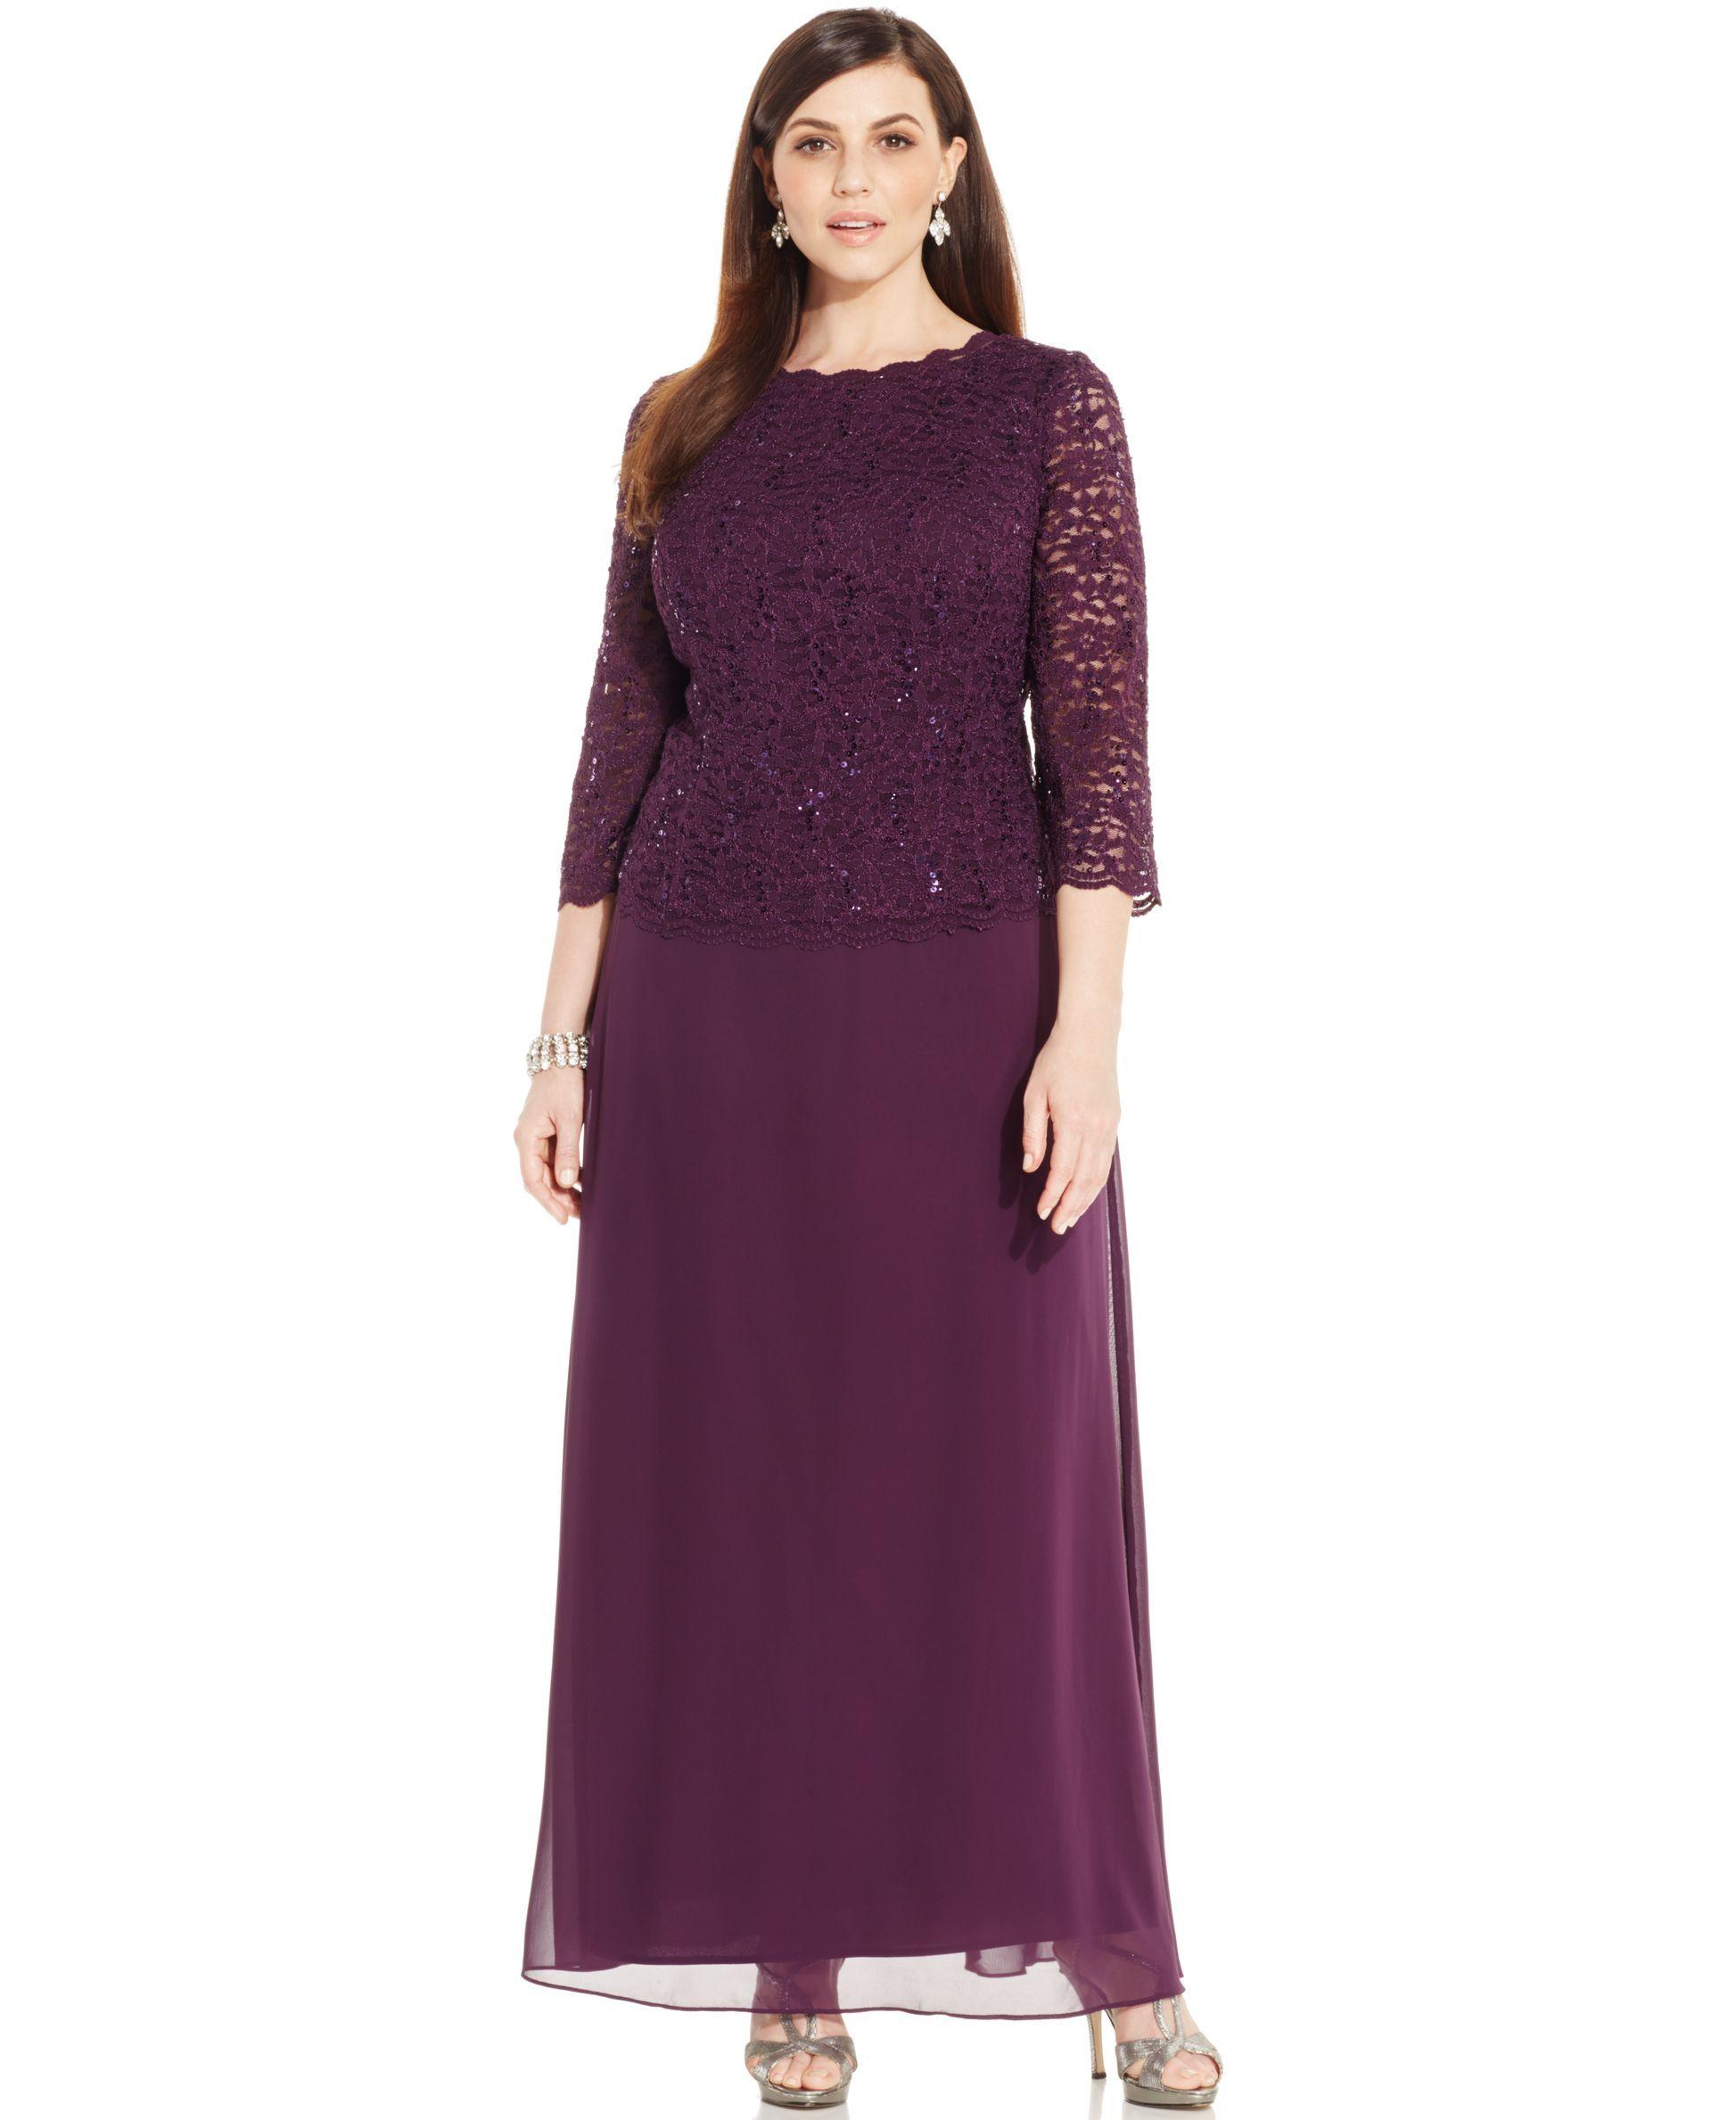 e47ccf39dee92 Alex Evenings Plus Size Three-Quarter-Sleeve Sequined Lace Gown - Dresses - Plus  Sizes - Macy's